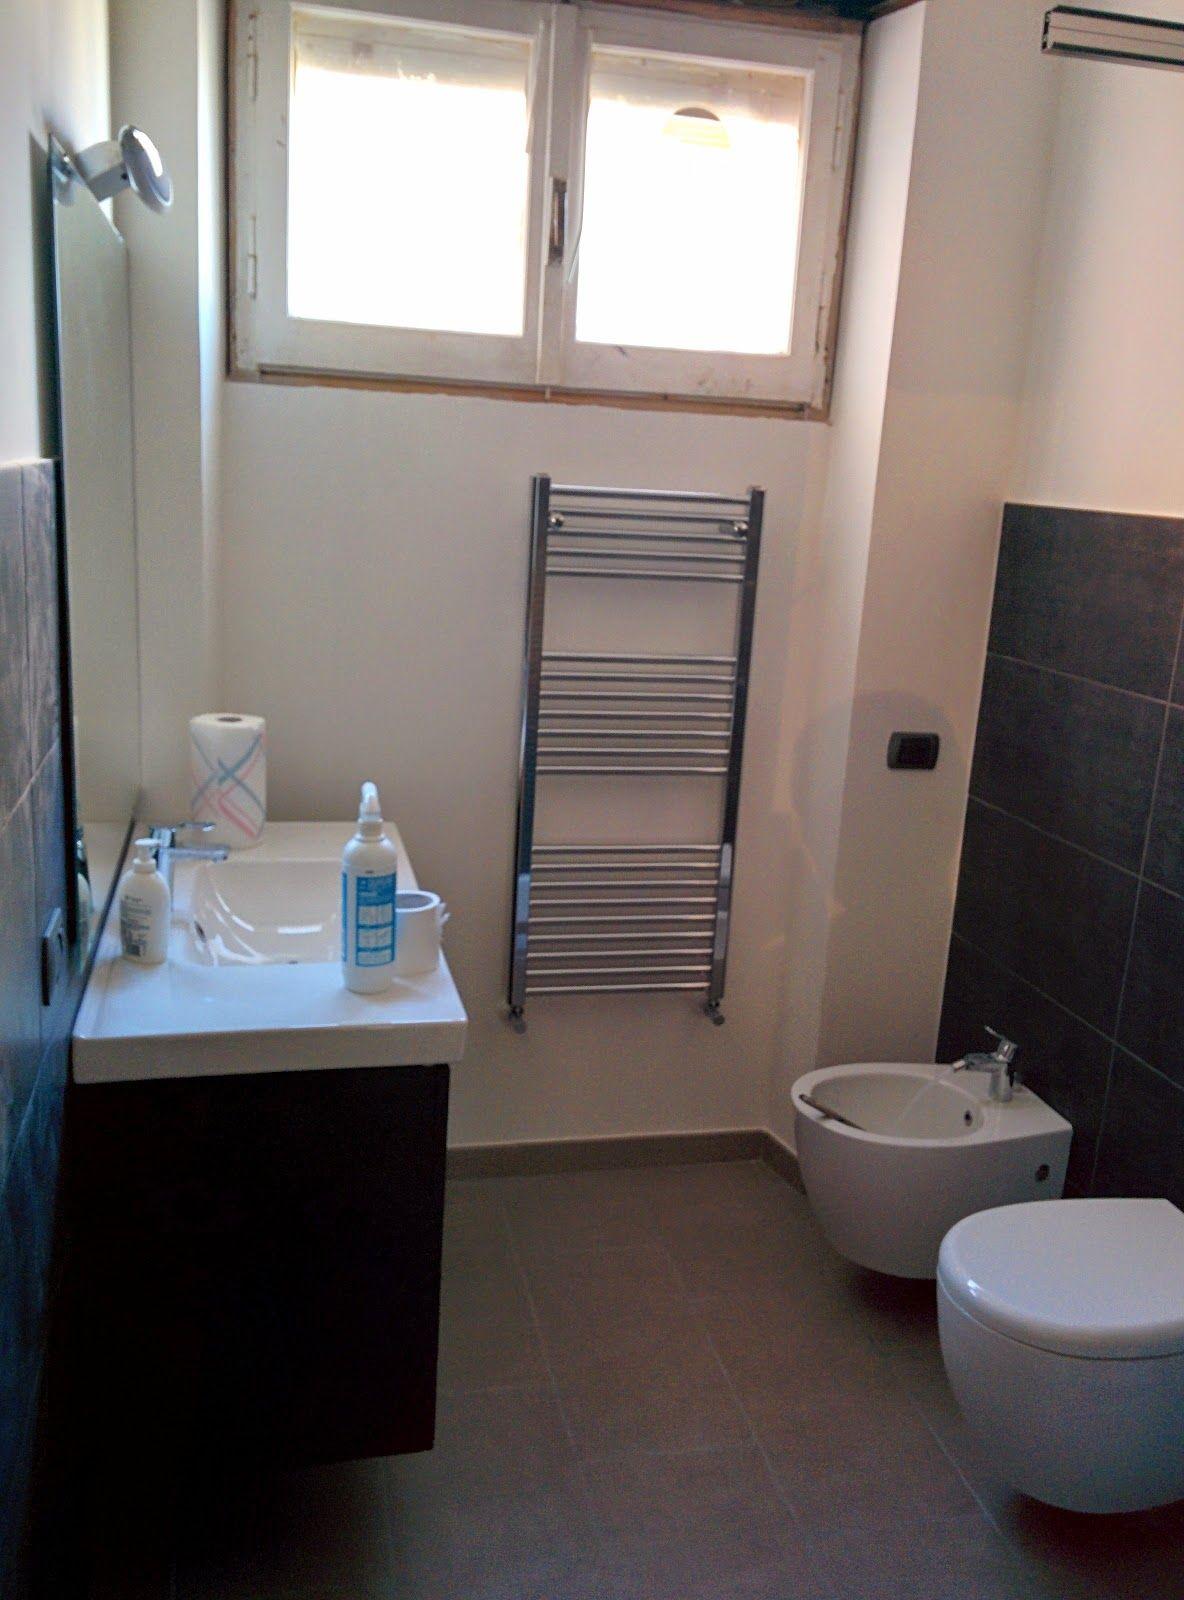 Bagno secondario con rivestimento a parete a media altezza - Altezza rivestimenti bagno ...